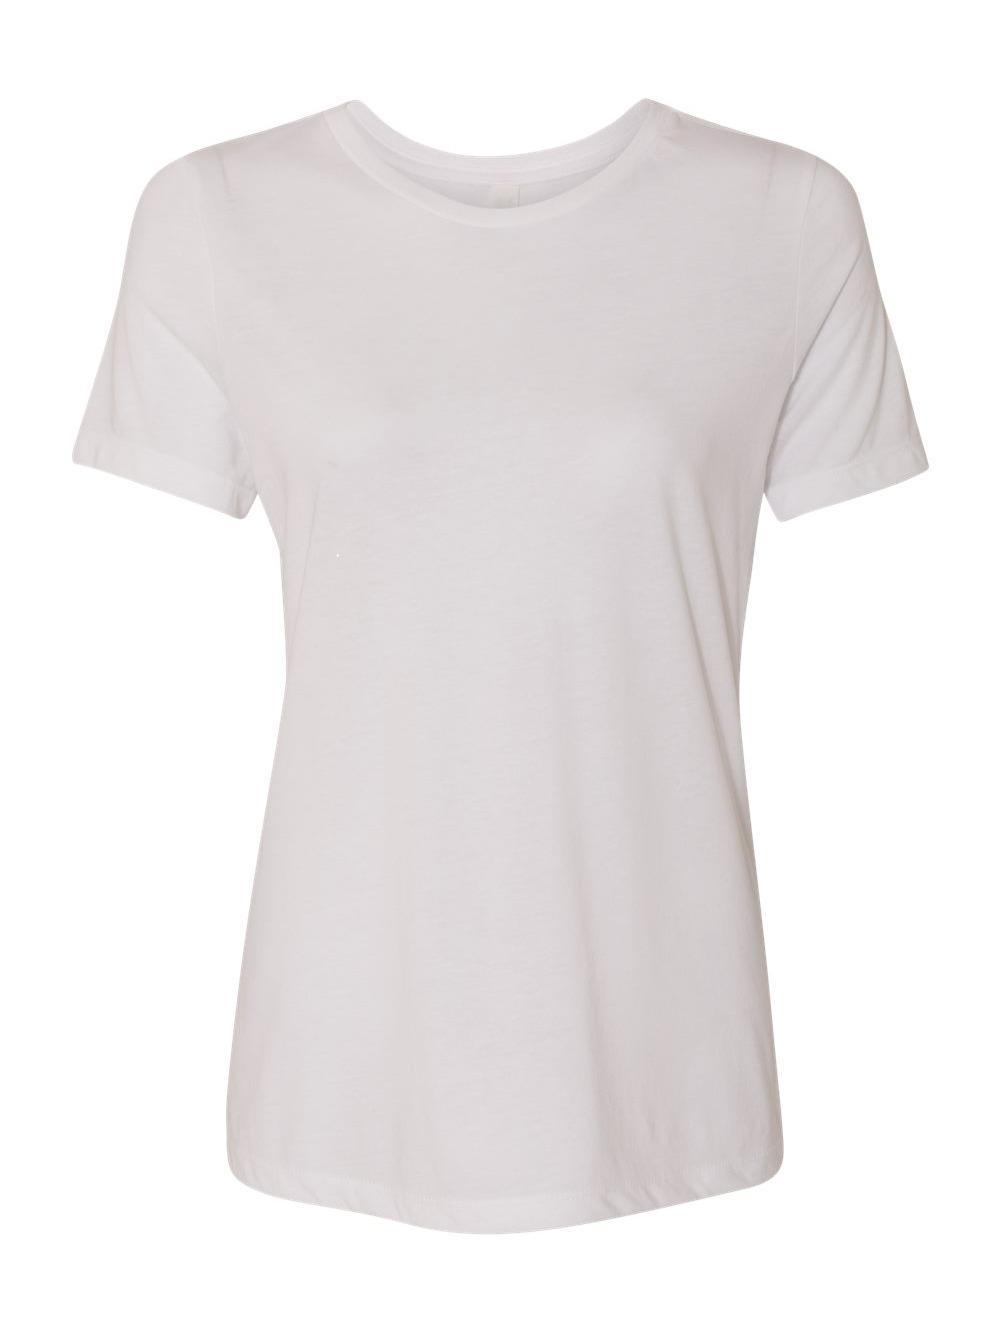 Bella-Canvas-Women-039-s-Relaxed-Short-Sleeve-Jersey-Tee-6400 thumbnail 84